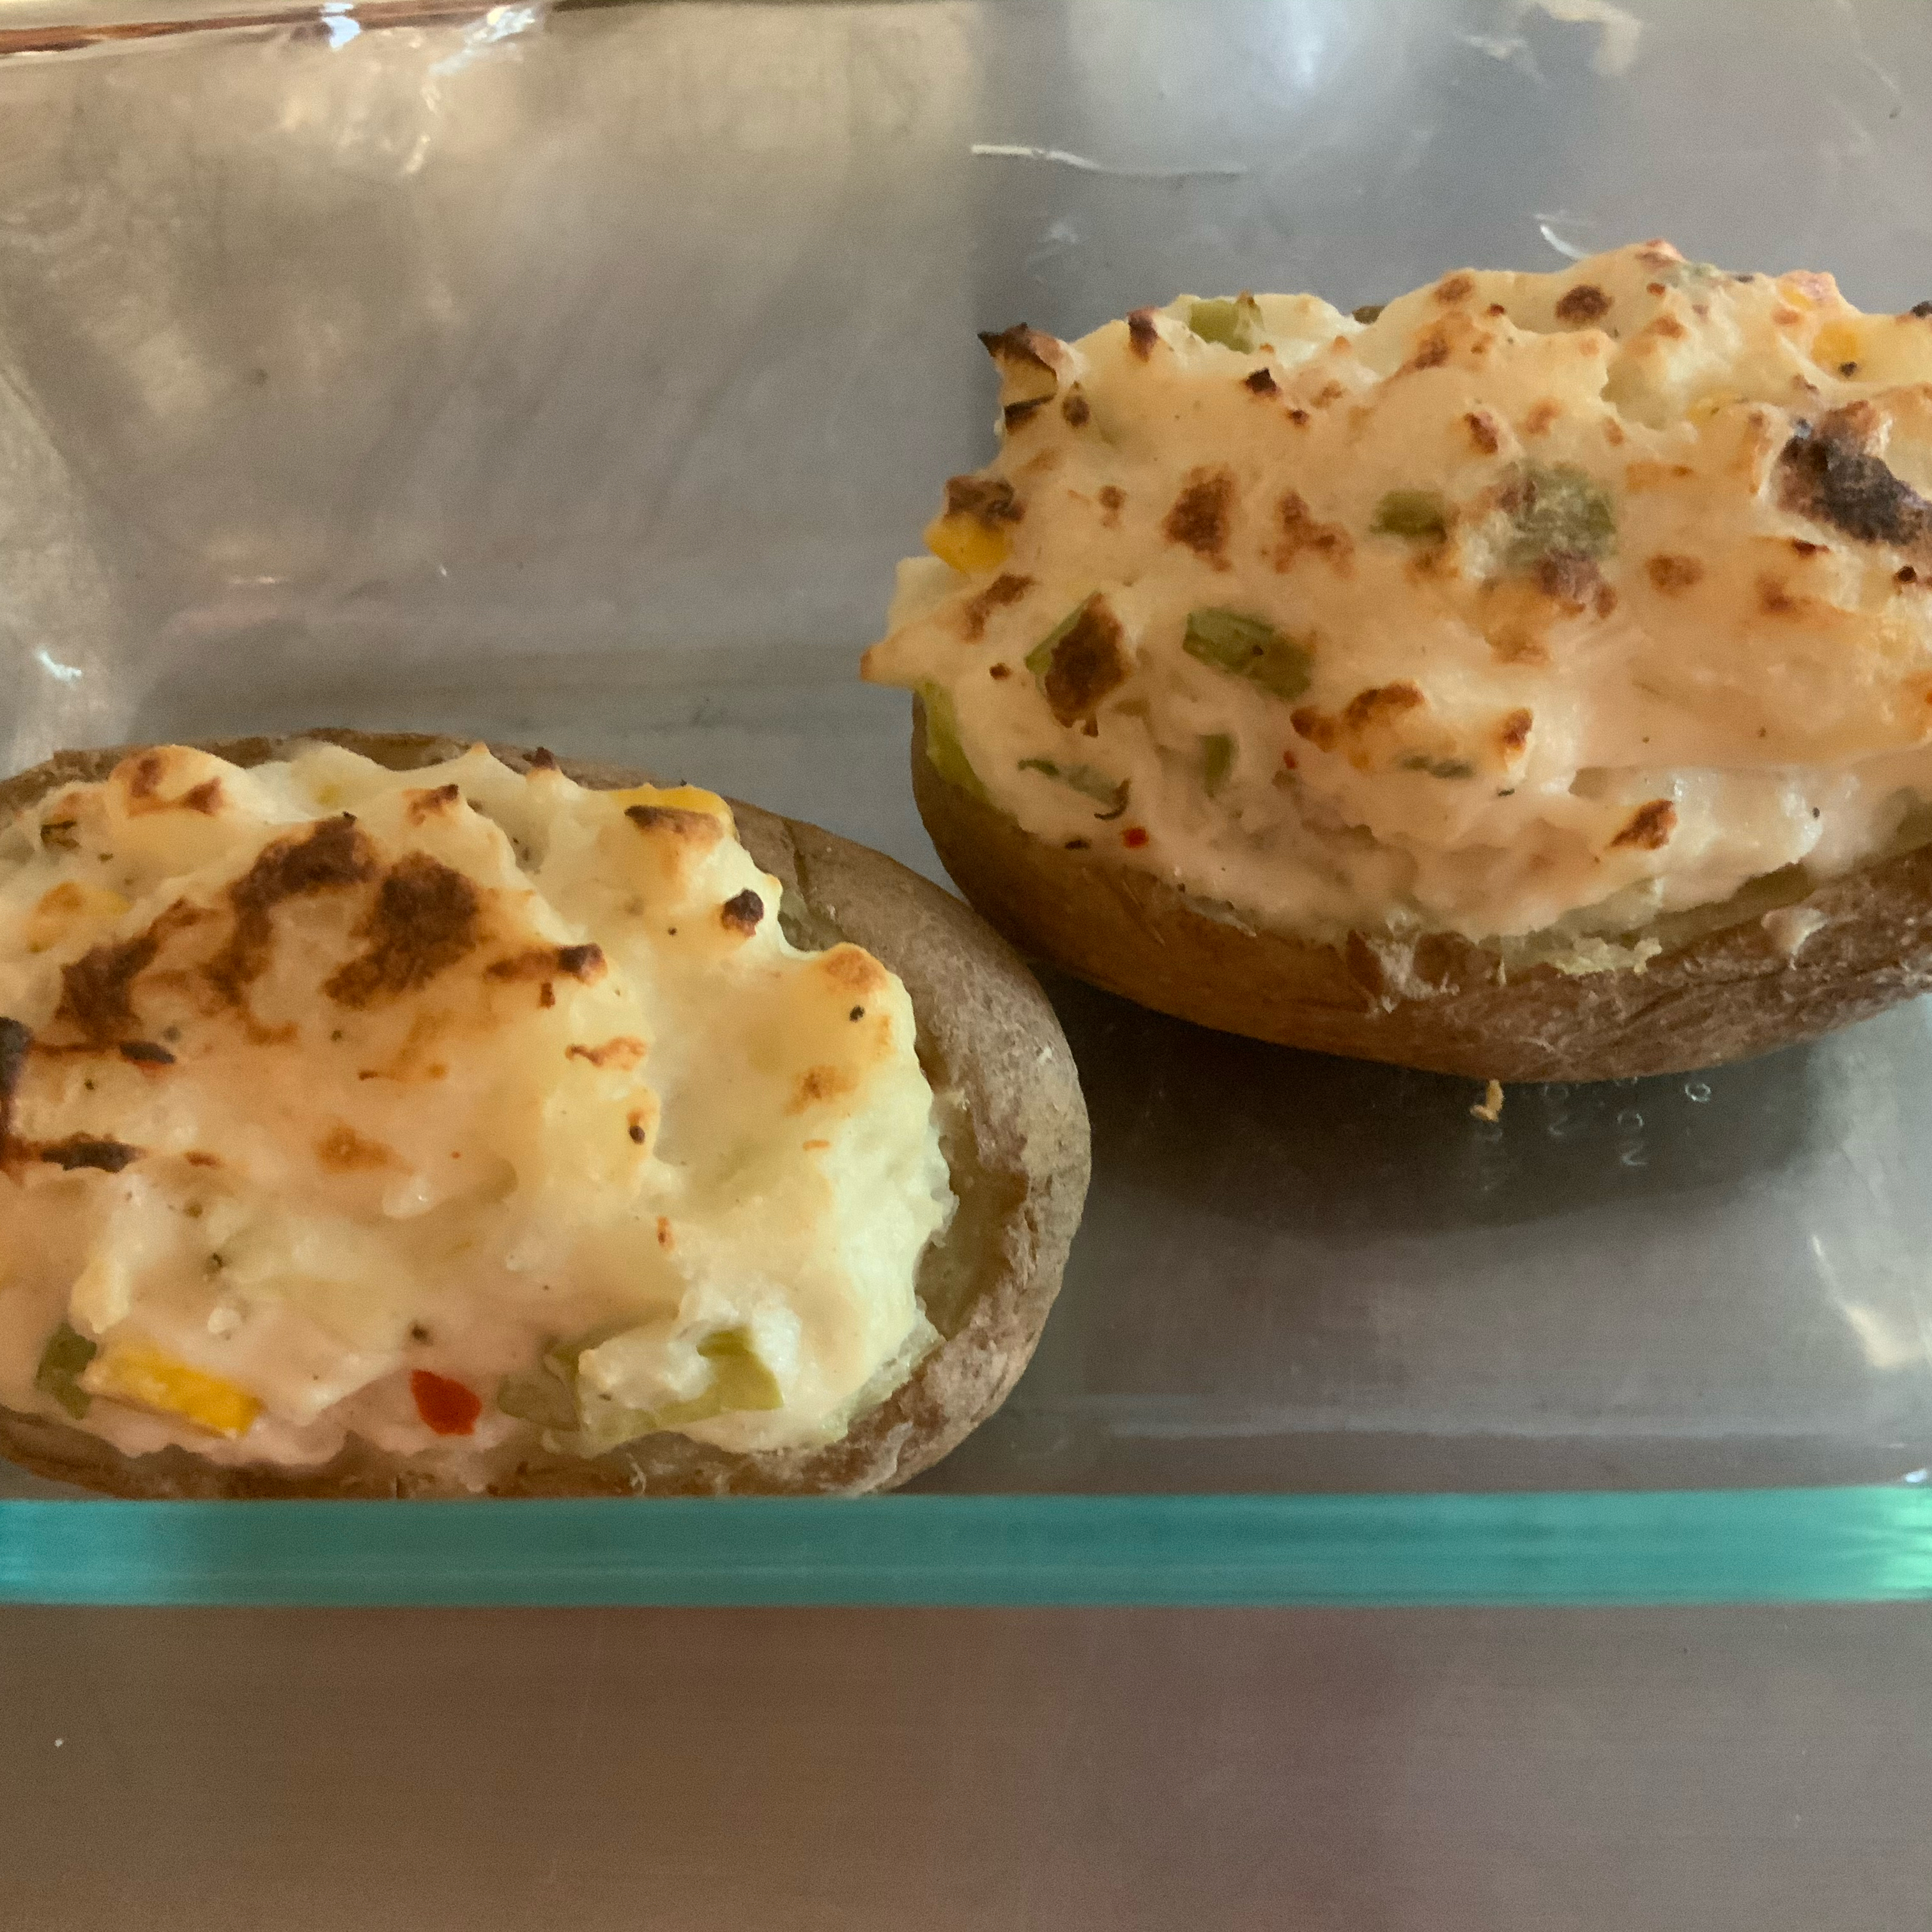 Healthier Ultimate Twice-Baked Potatoes Traycee1234